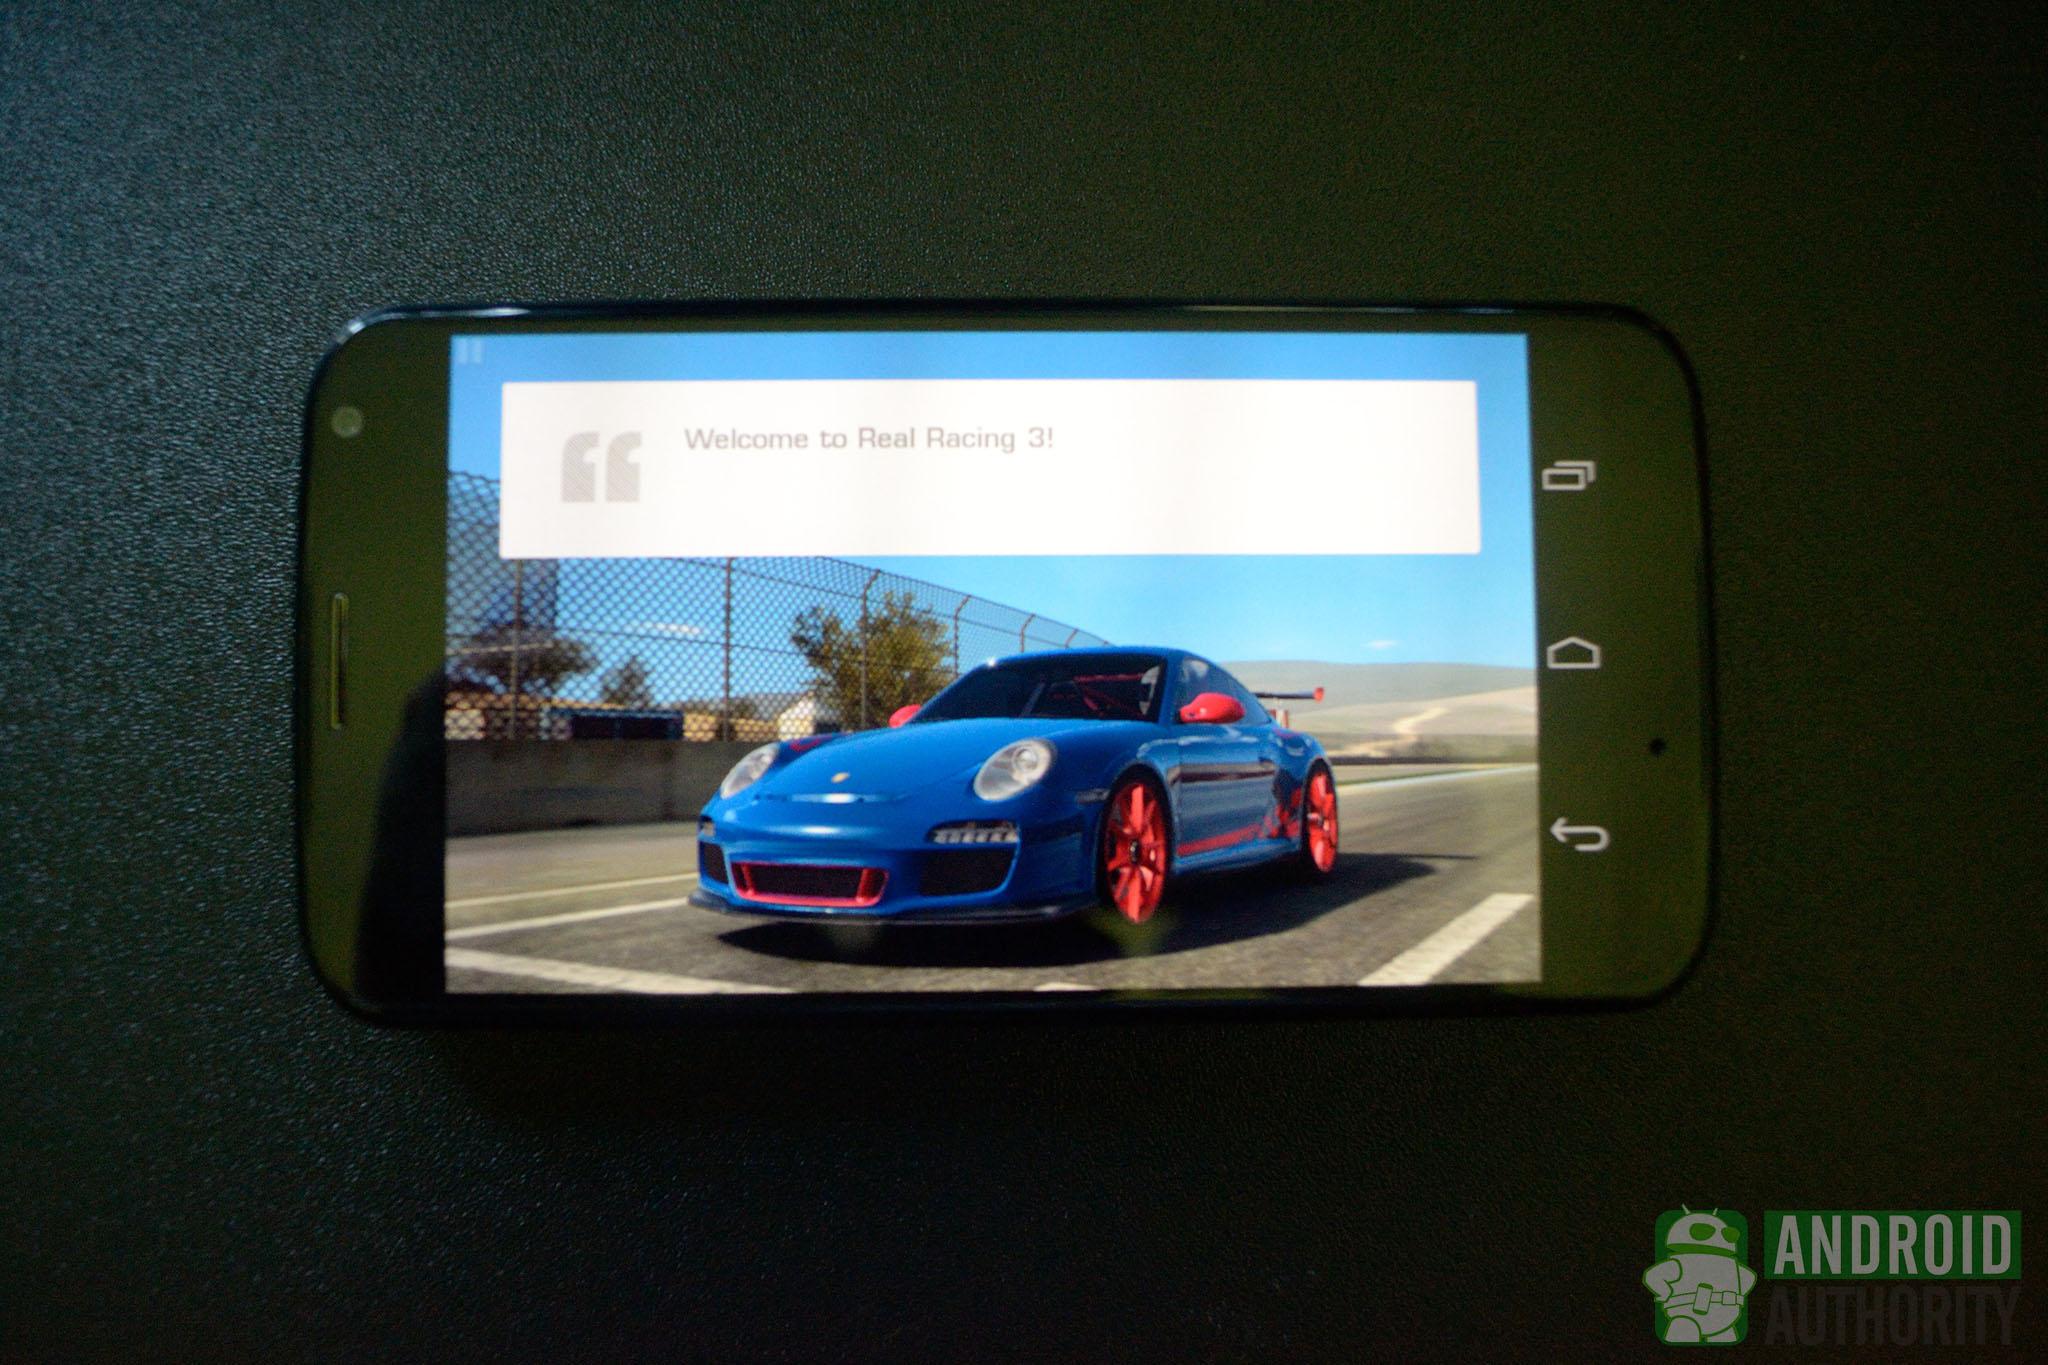 moto-x-aa-review-real-racing-3